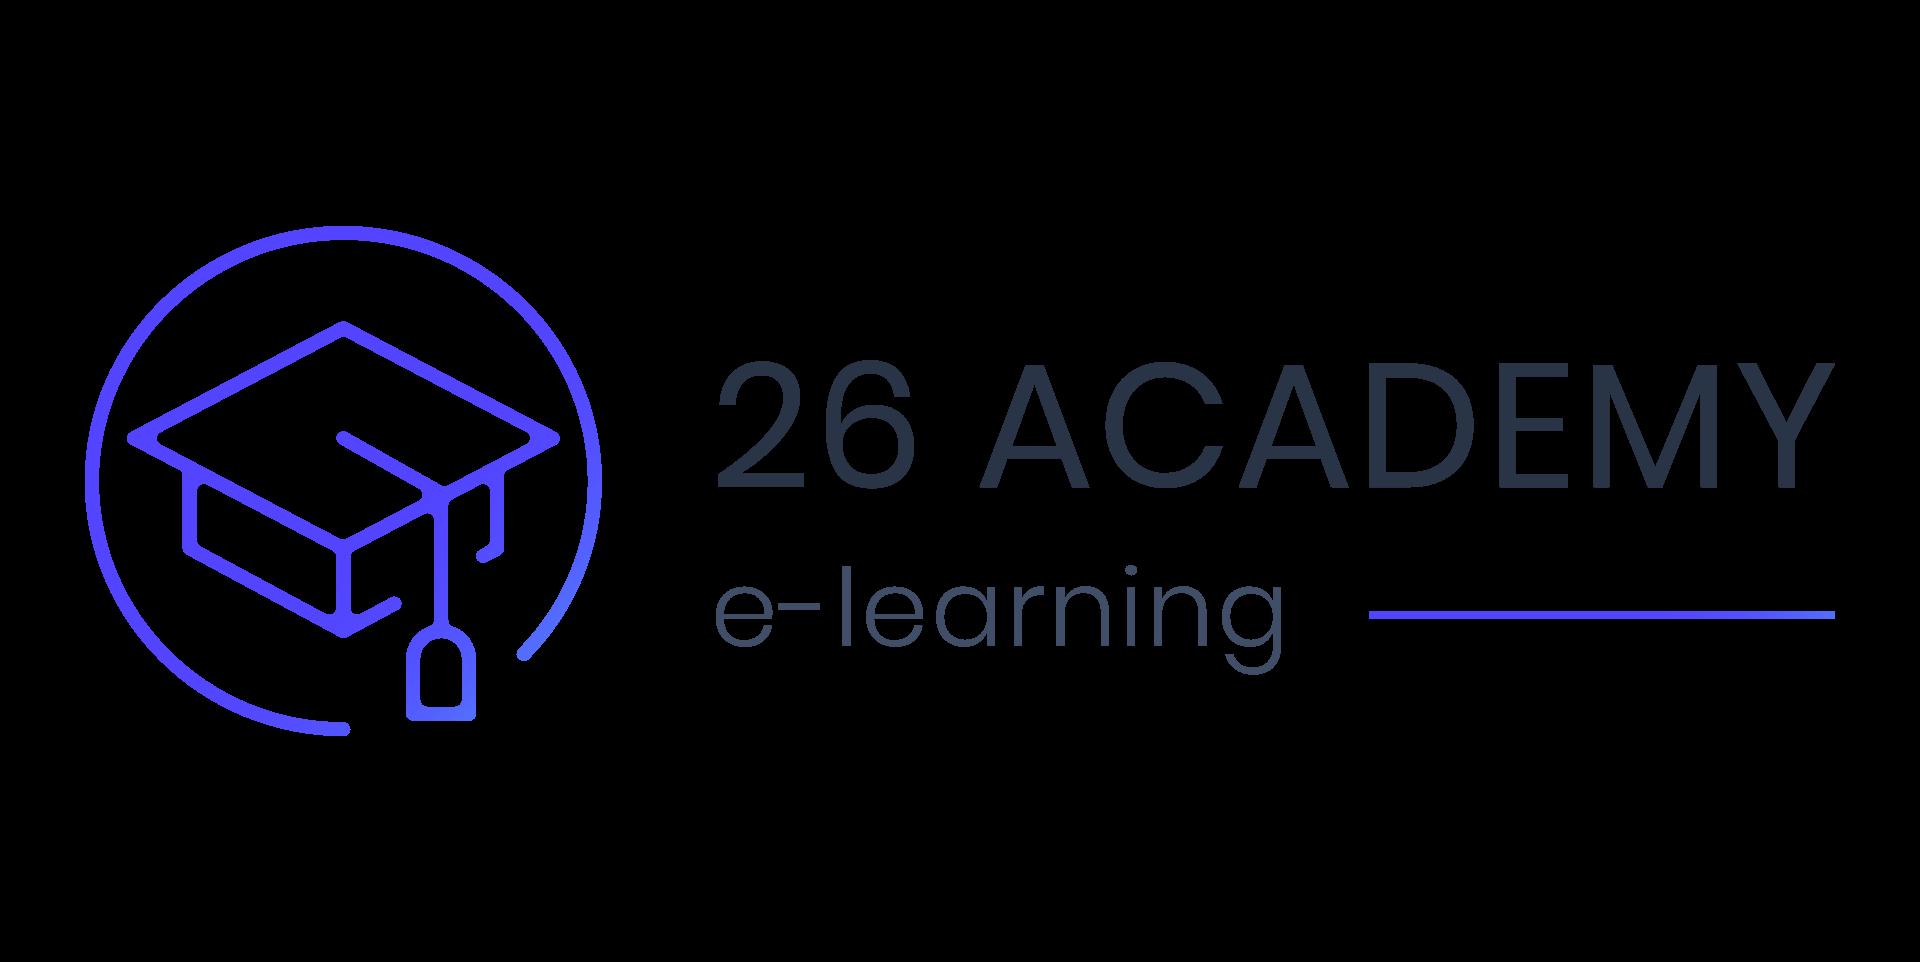 26Academy